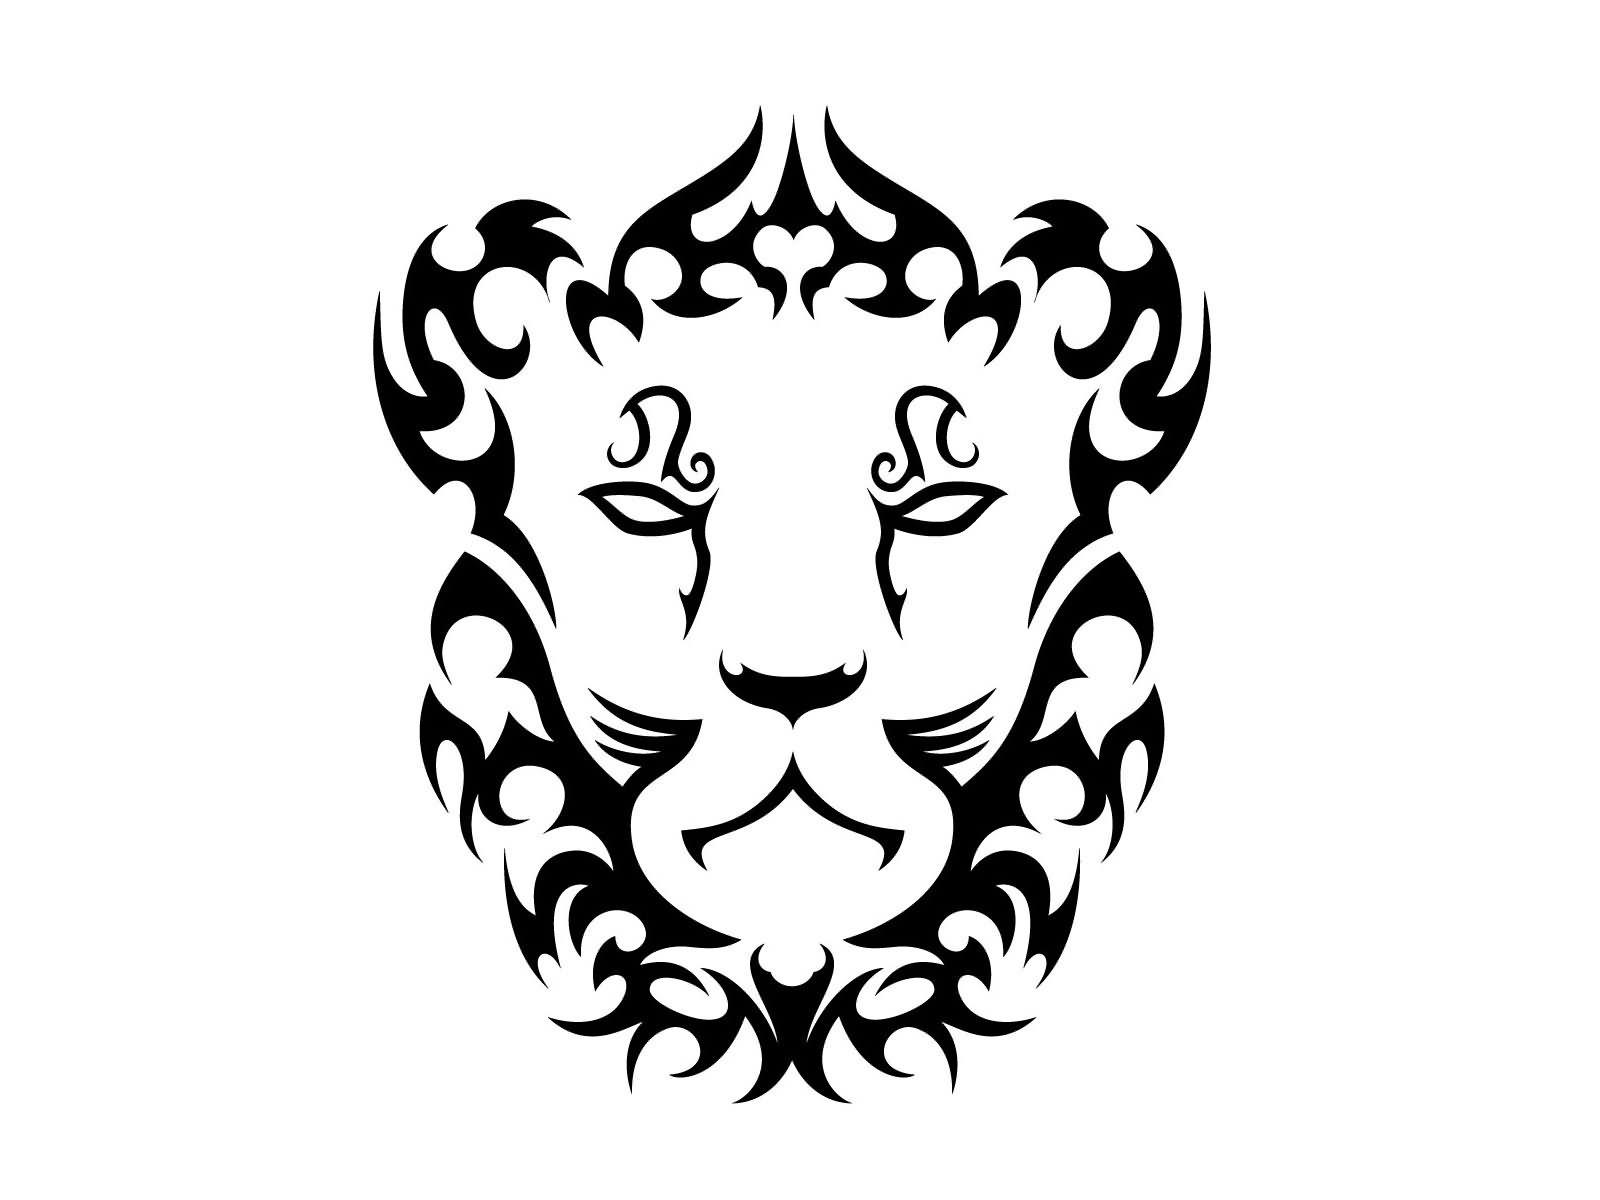 leo tribal tattoos crown gallery. Black Bedroom Furniture Sets. Home Design Ideas